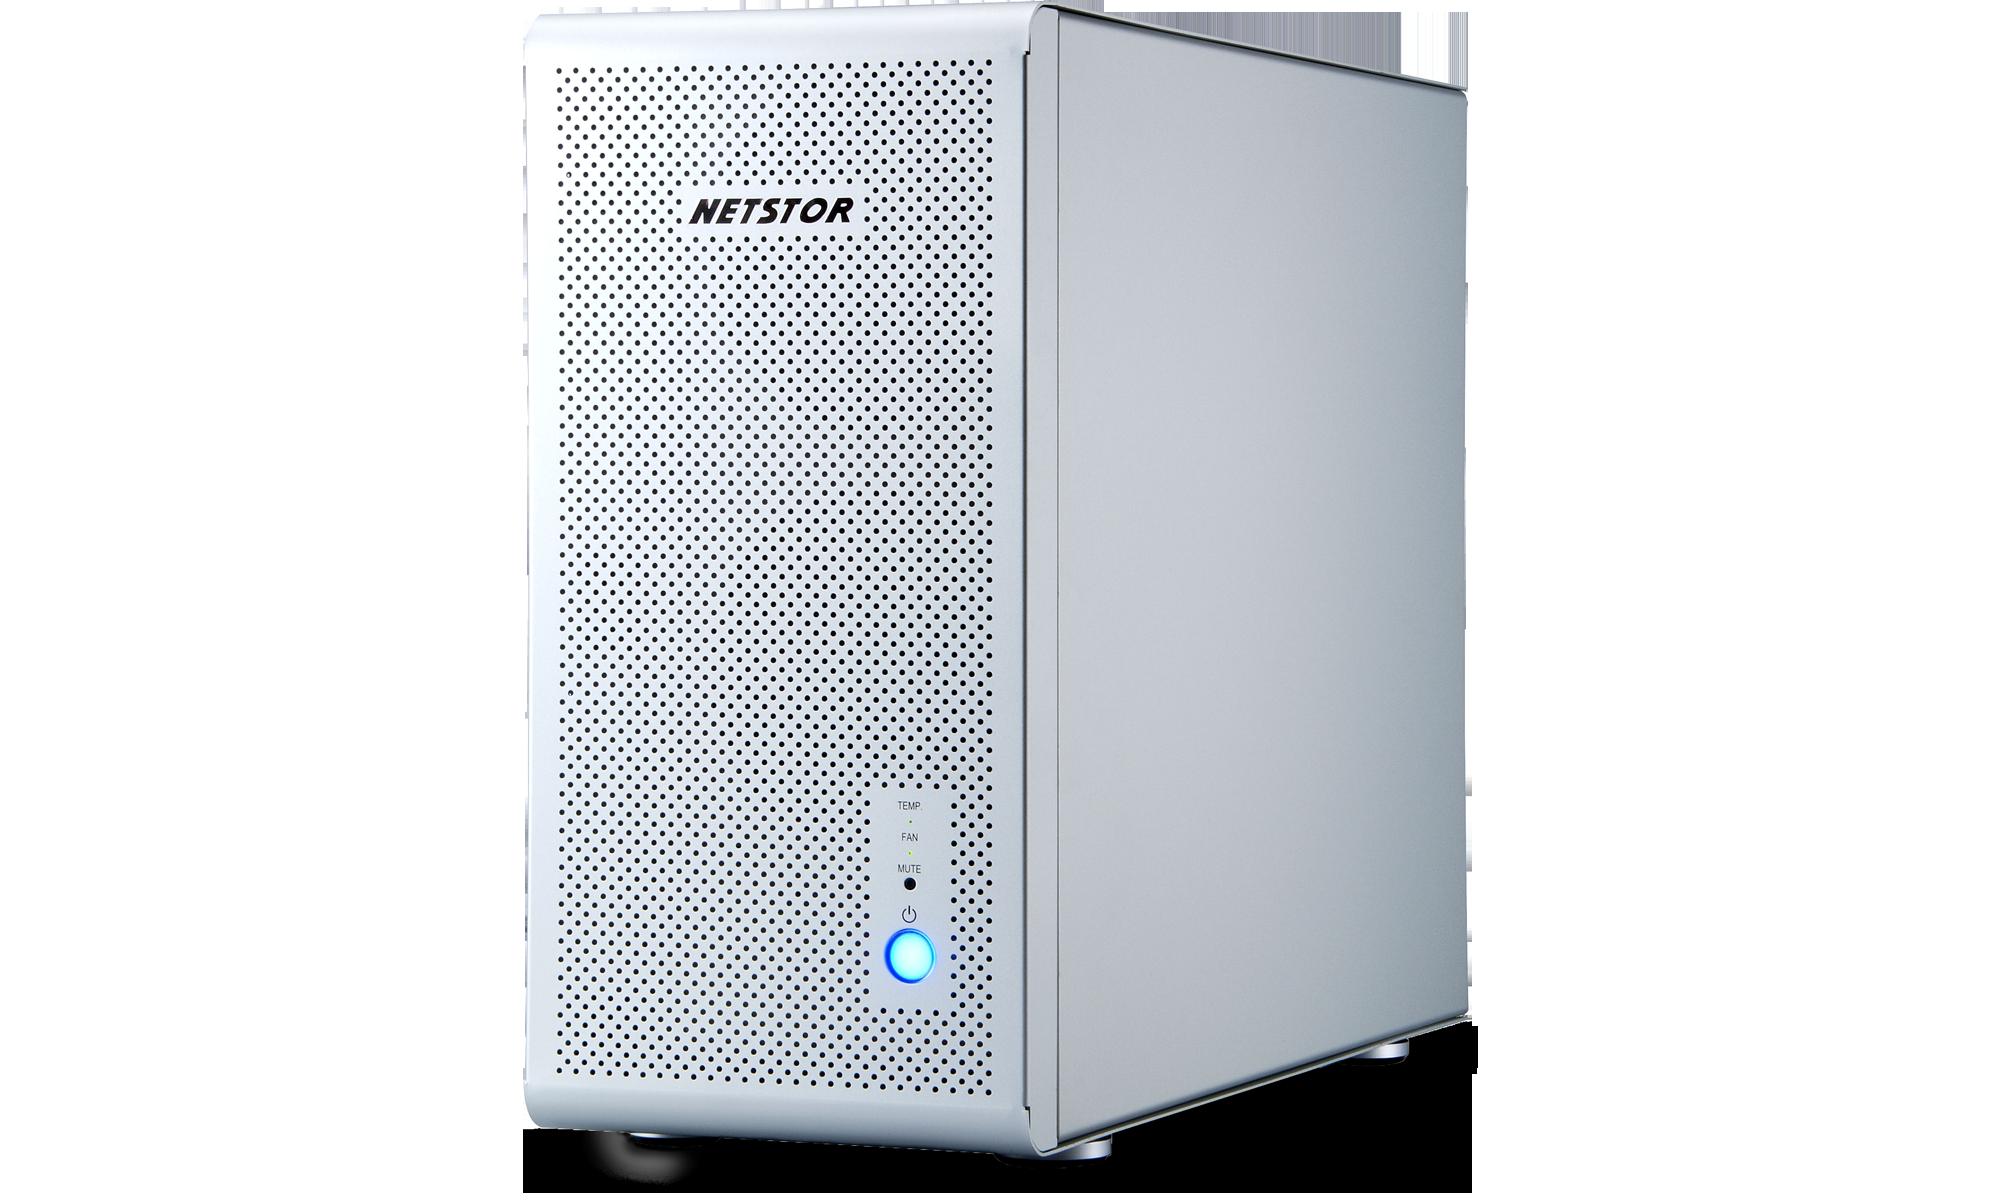 Netstor Technology